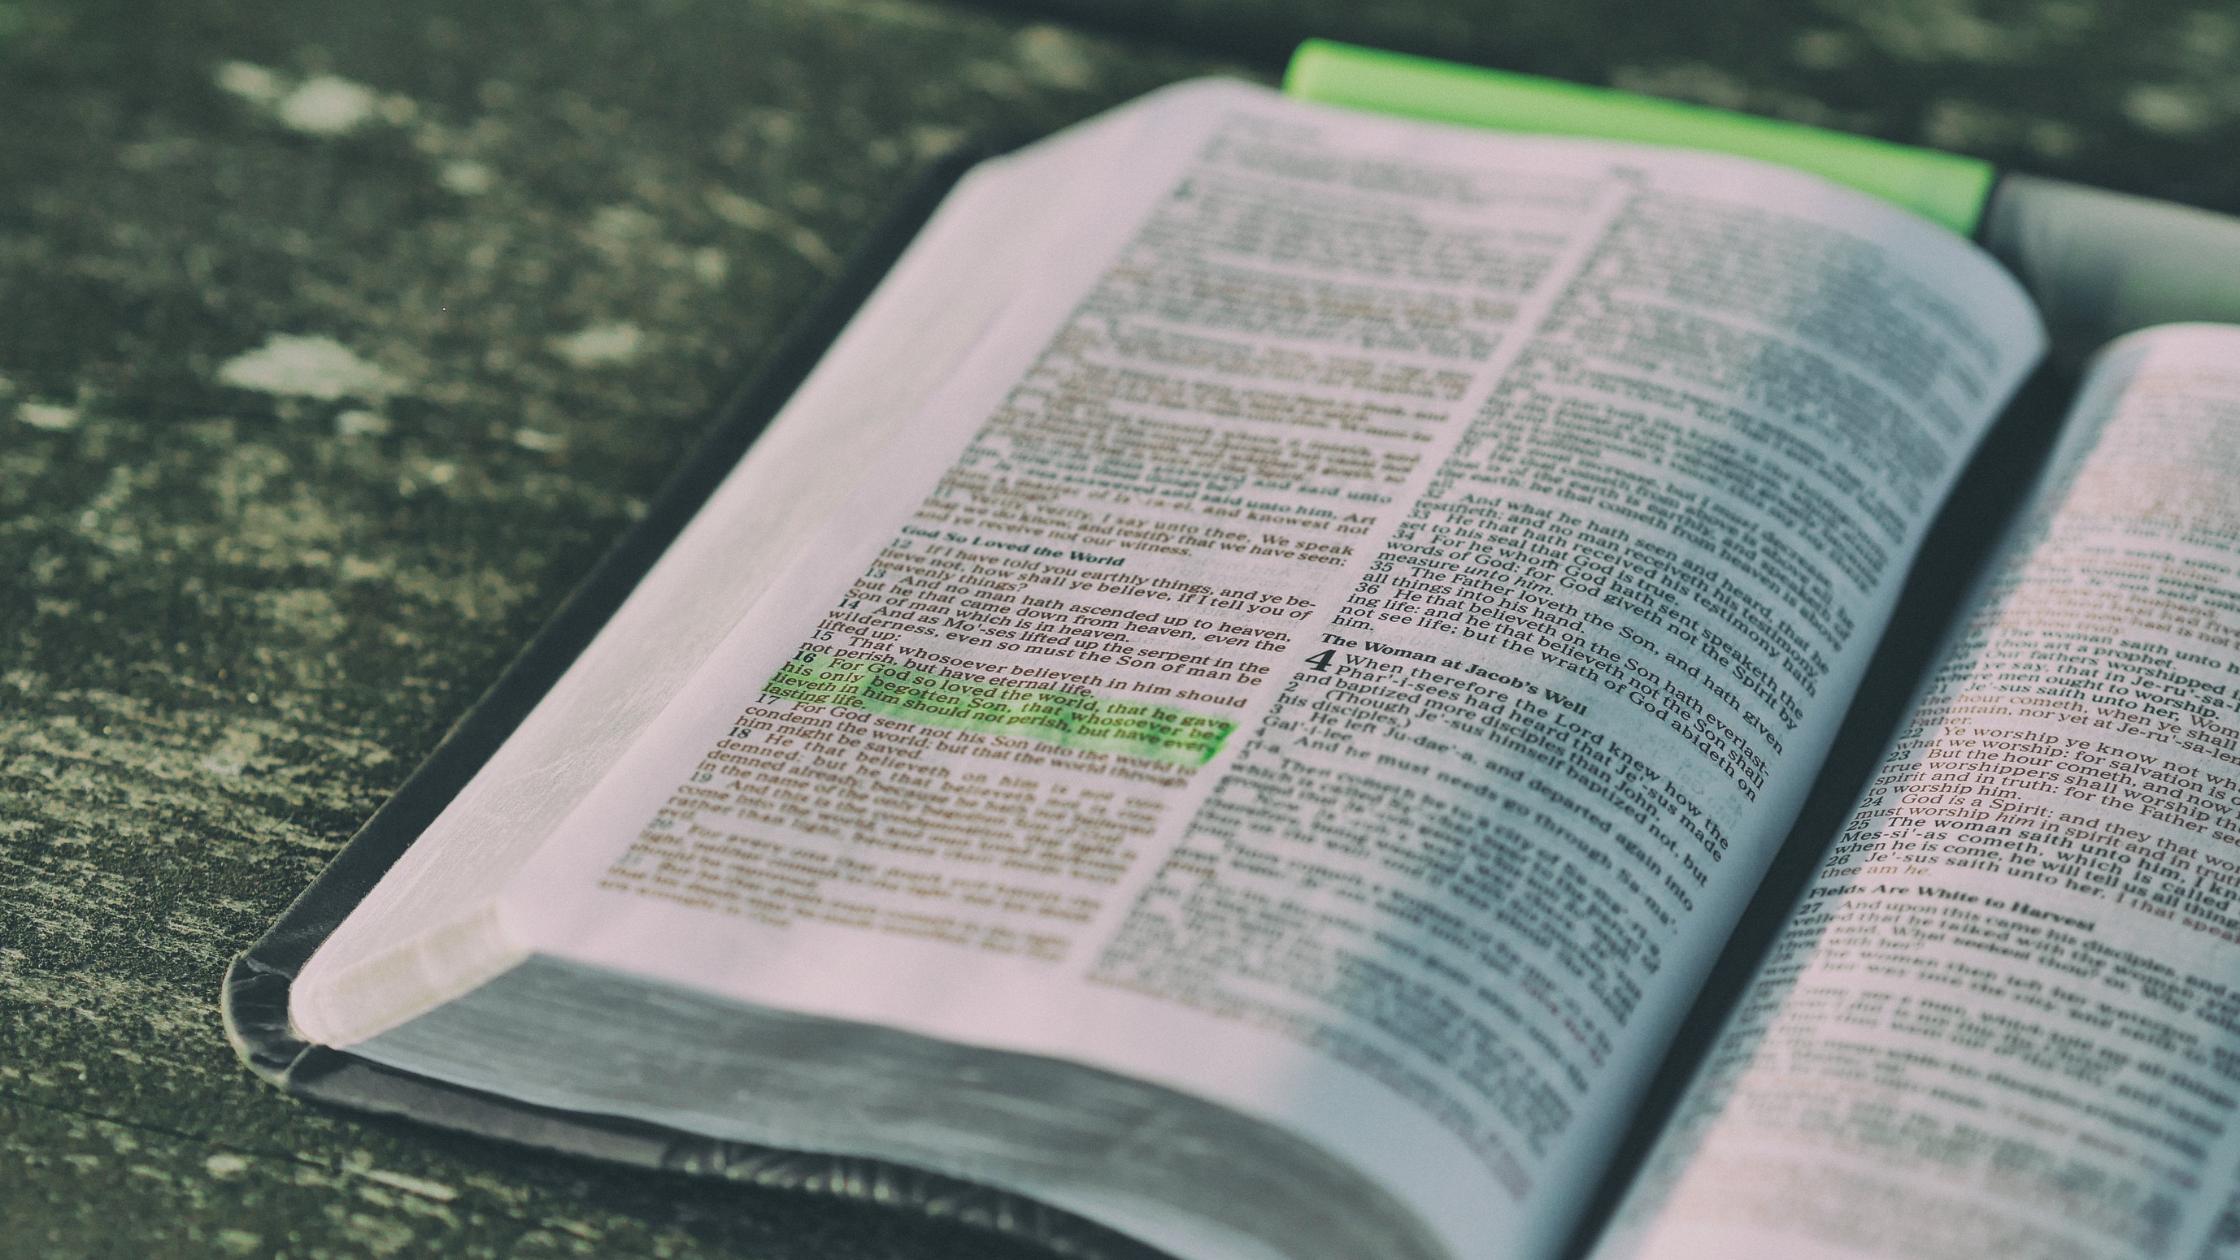 Scripture engagement - Bible open